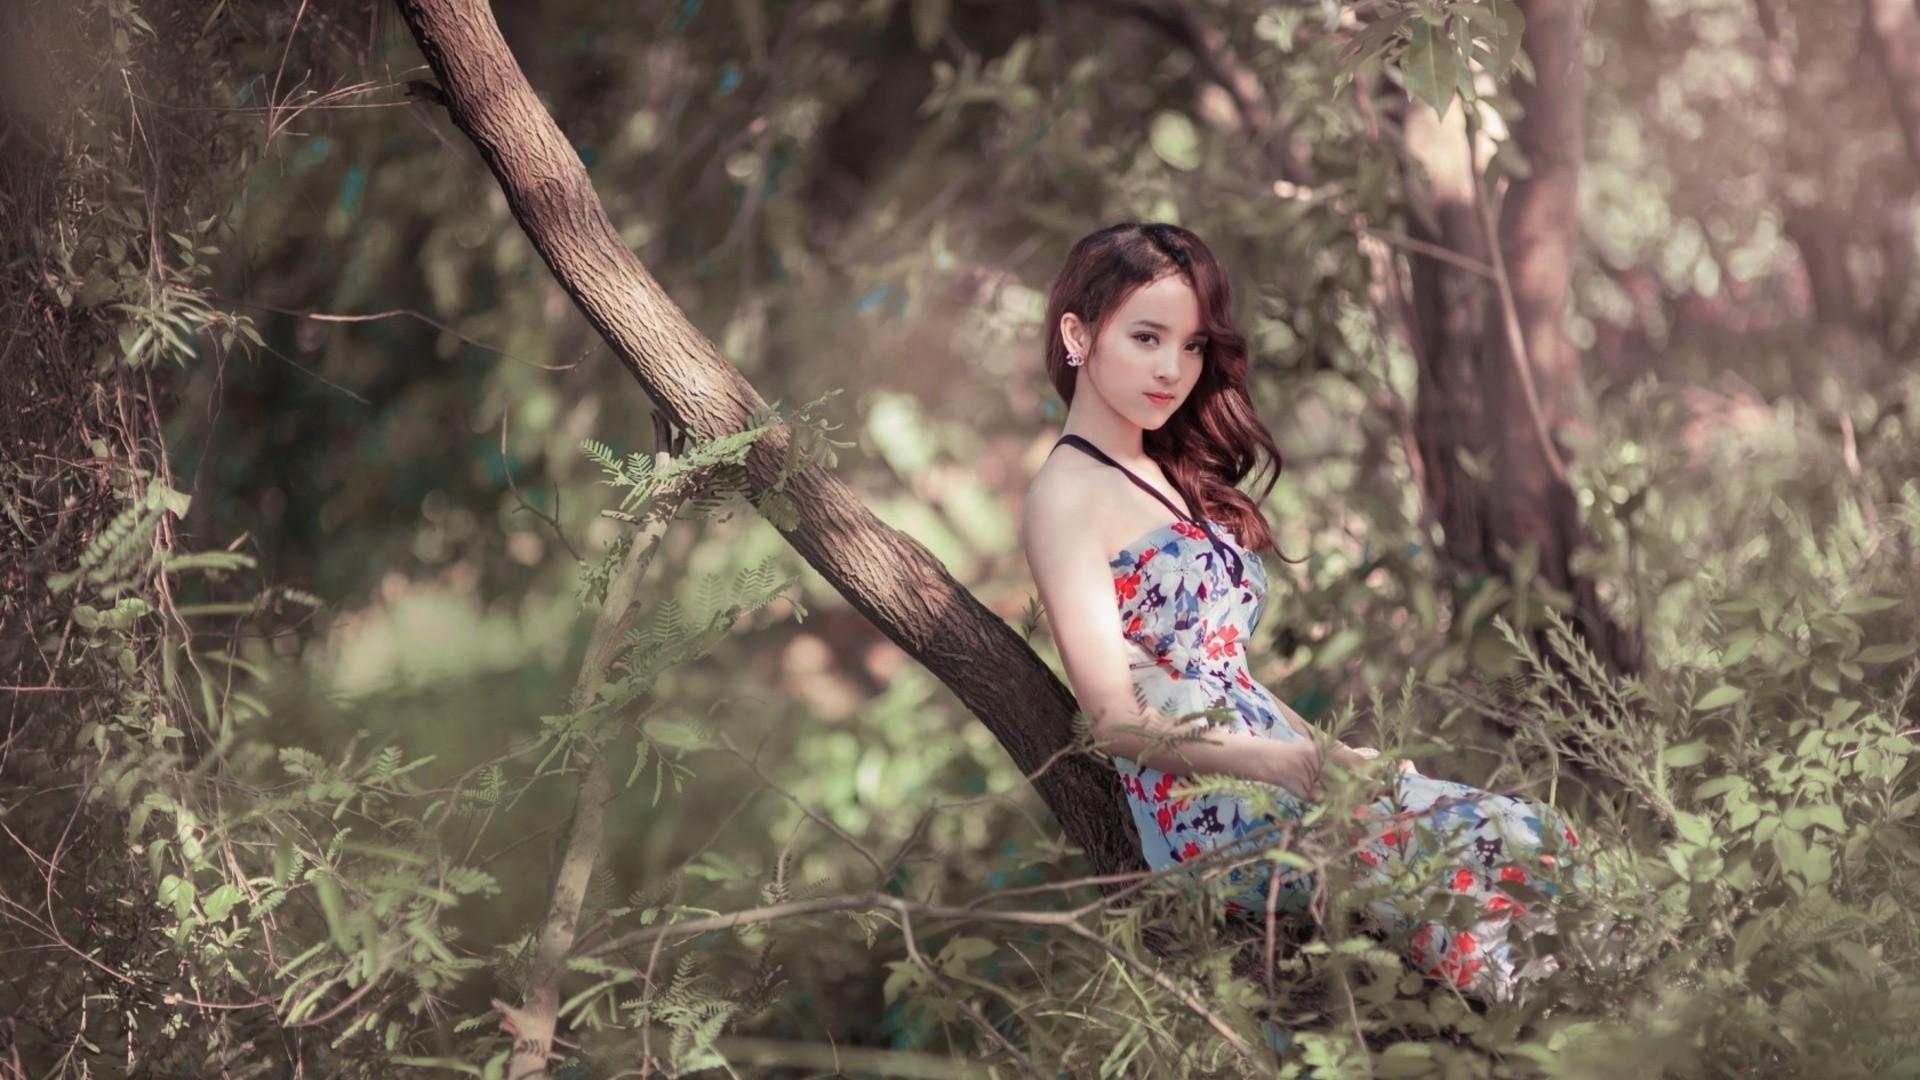 Wallpaper : sunlight, trees, forest, women outdoors, model